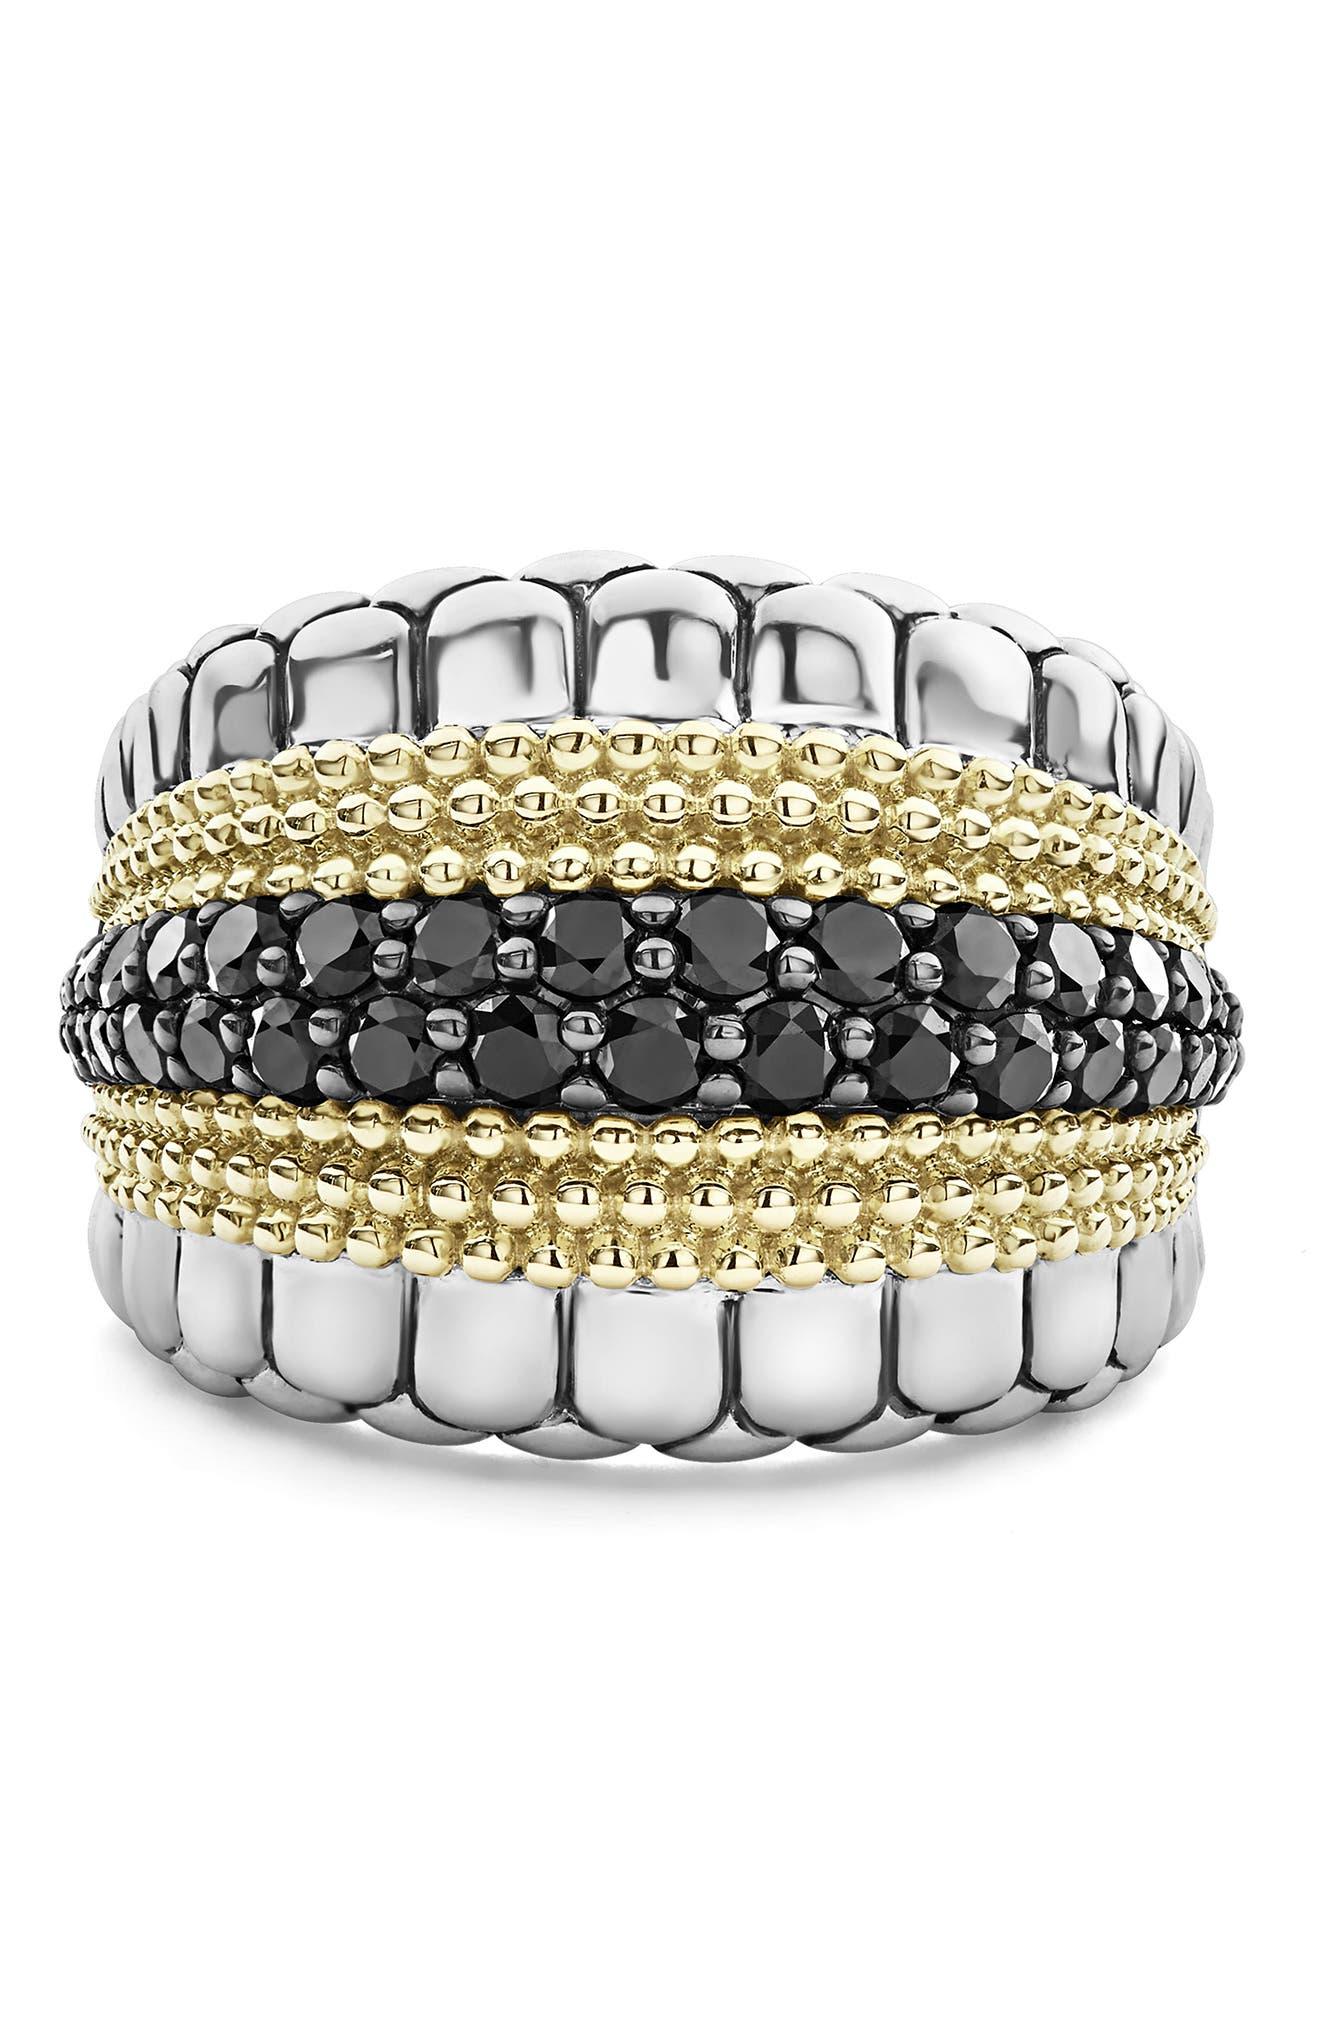 Diamond Lux Black Diamond Band Ring,                             Alternate thumbnail 5, color,                             SILVER/ GOLD/ BLACK DIAMOND